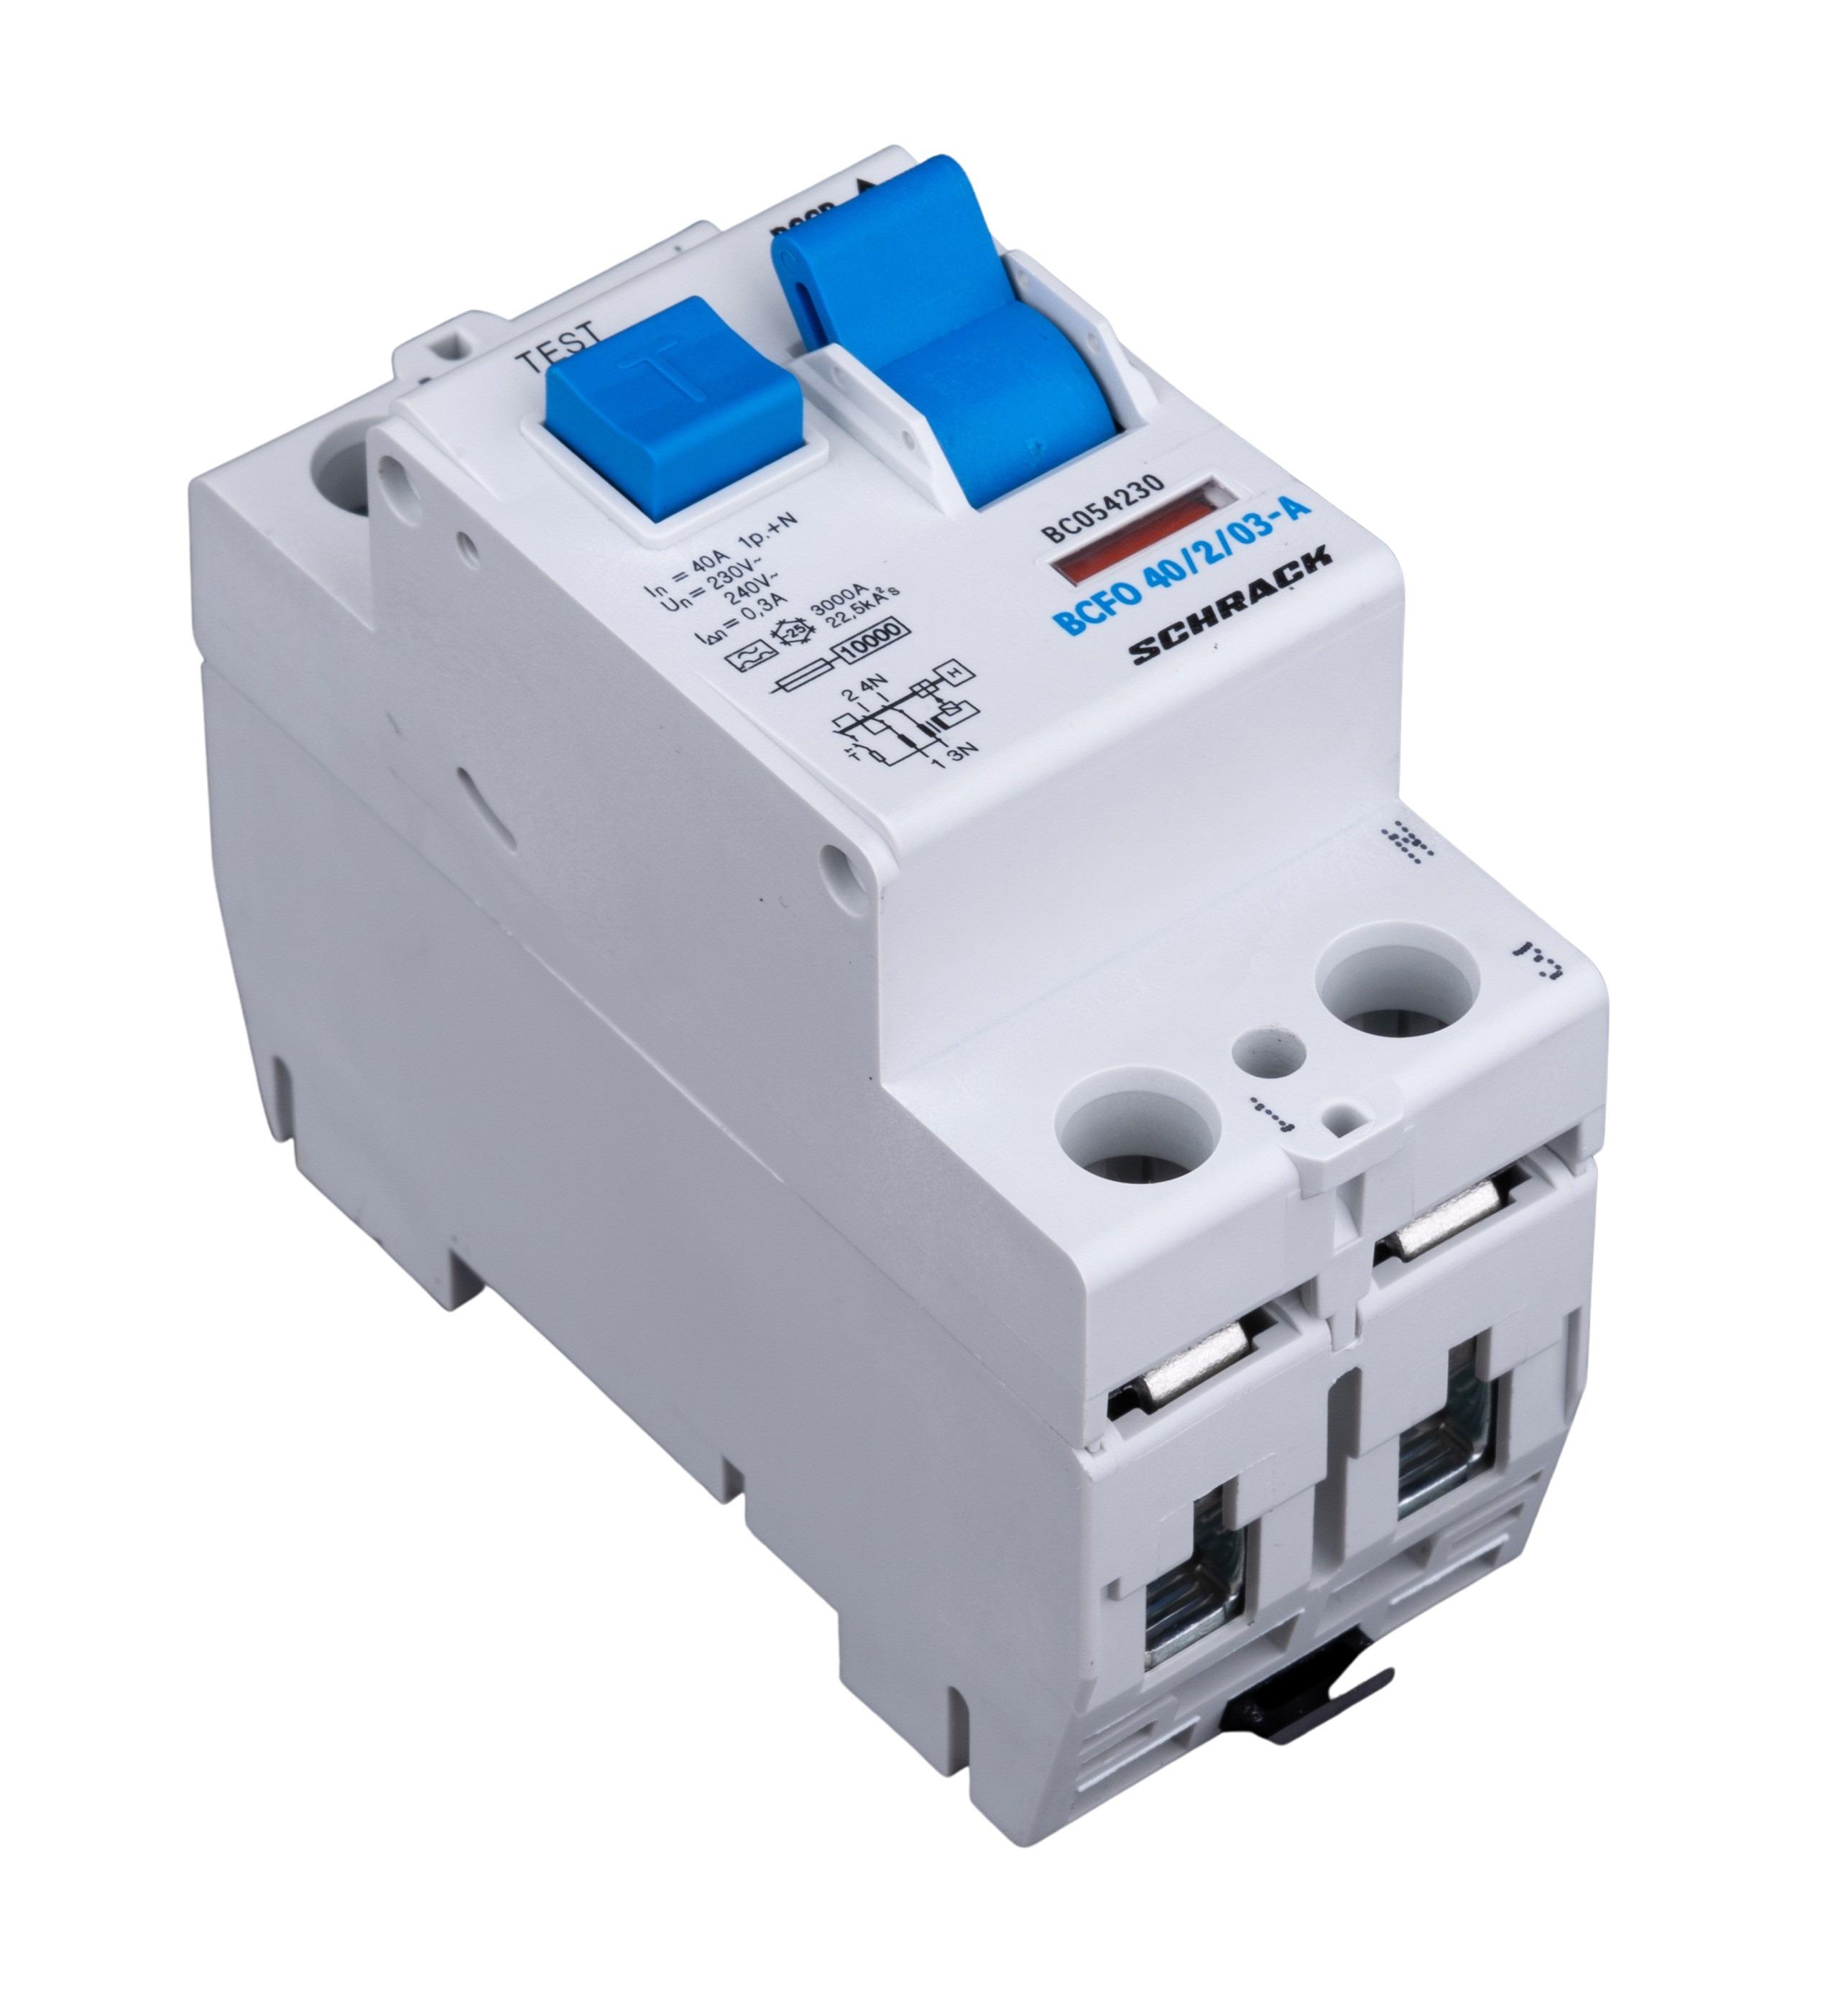 1 Stk FI-Schalter, 40A, 2-polig, 300mA, Typ A (Puls) BC054230--